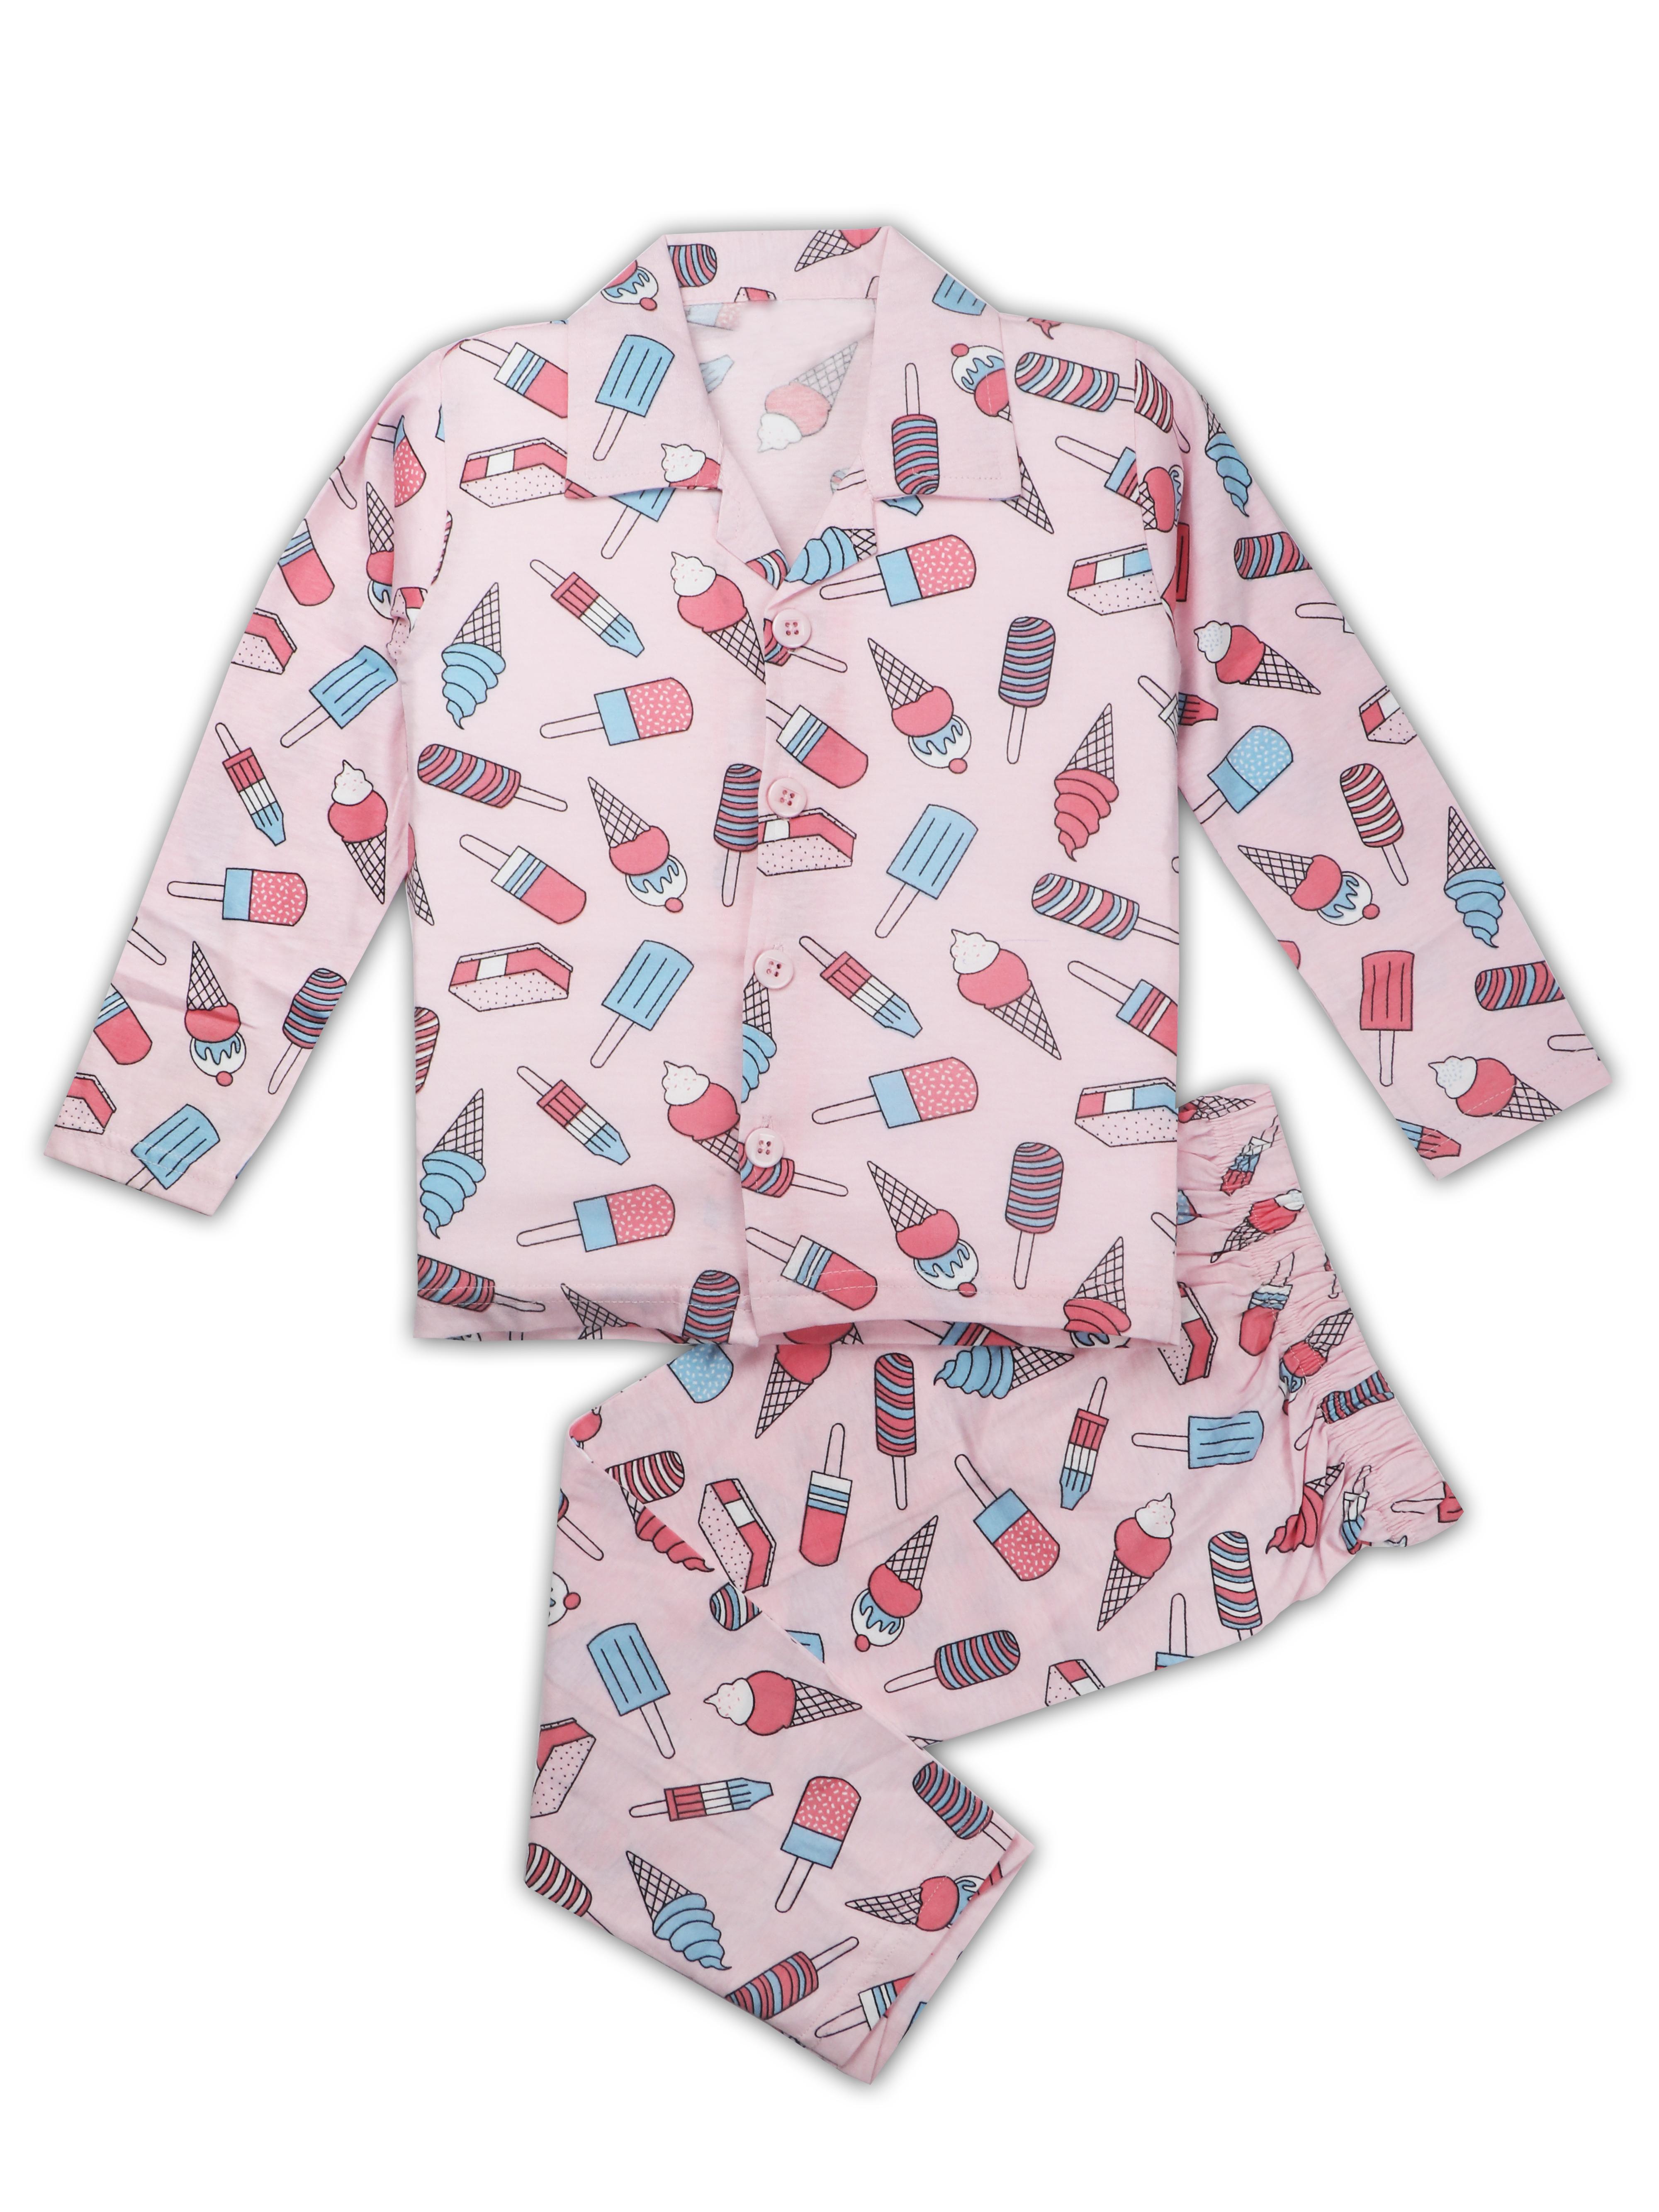 AAAKAR | AAAKAR Full Sleeves Night Suit All Over Print Ice Cream - Pink